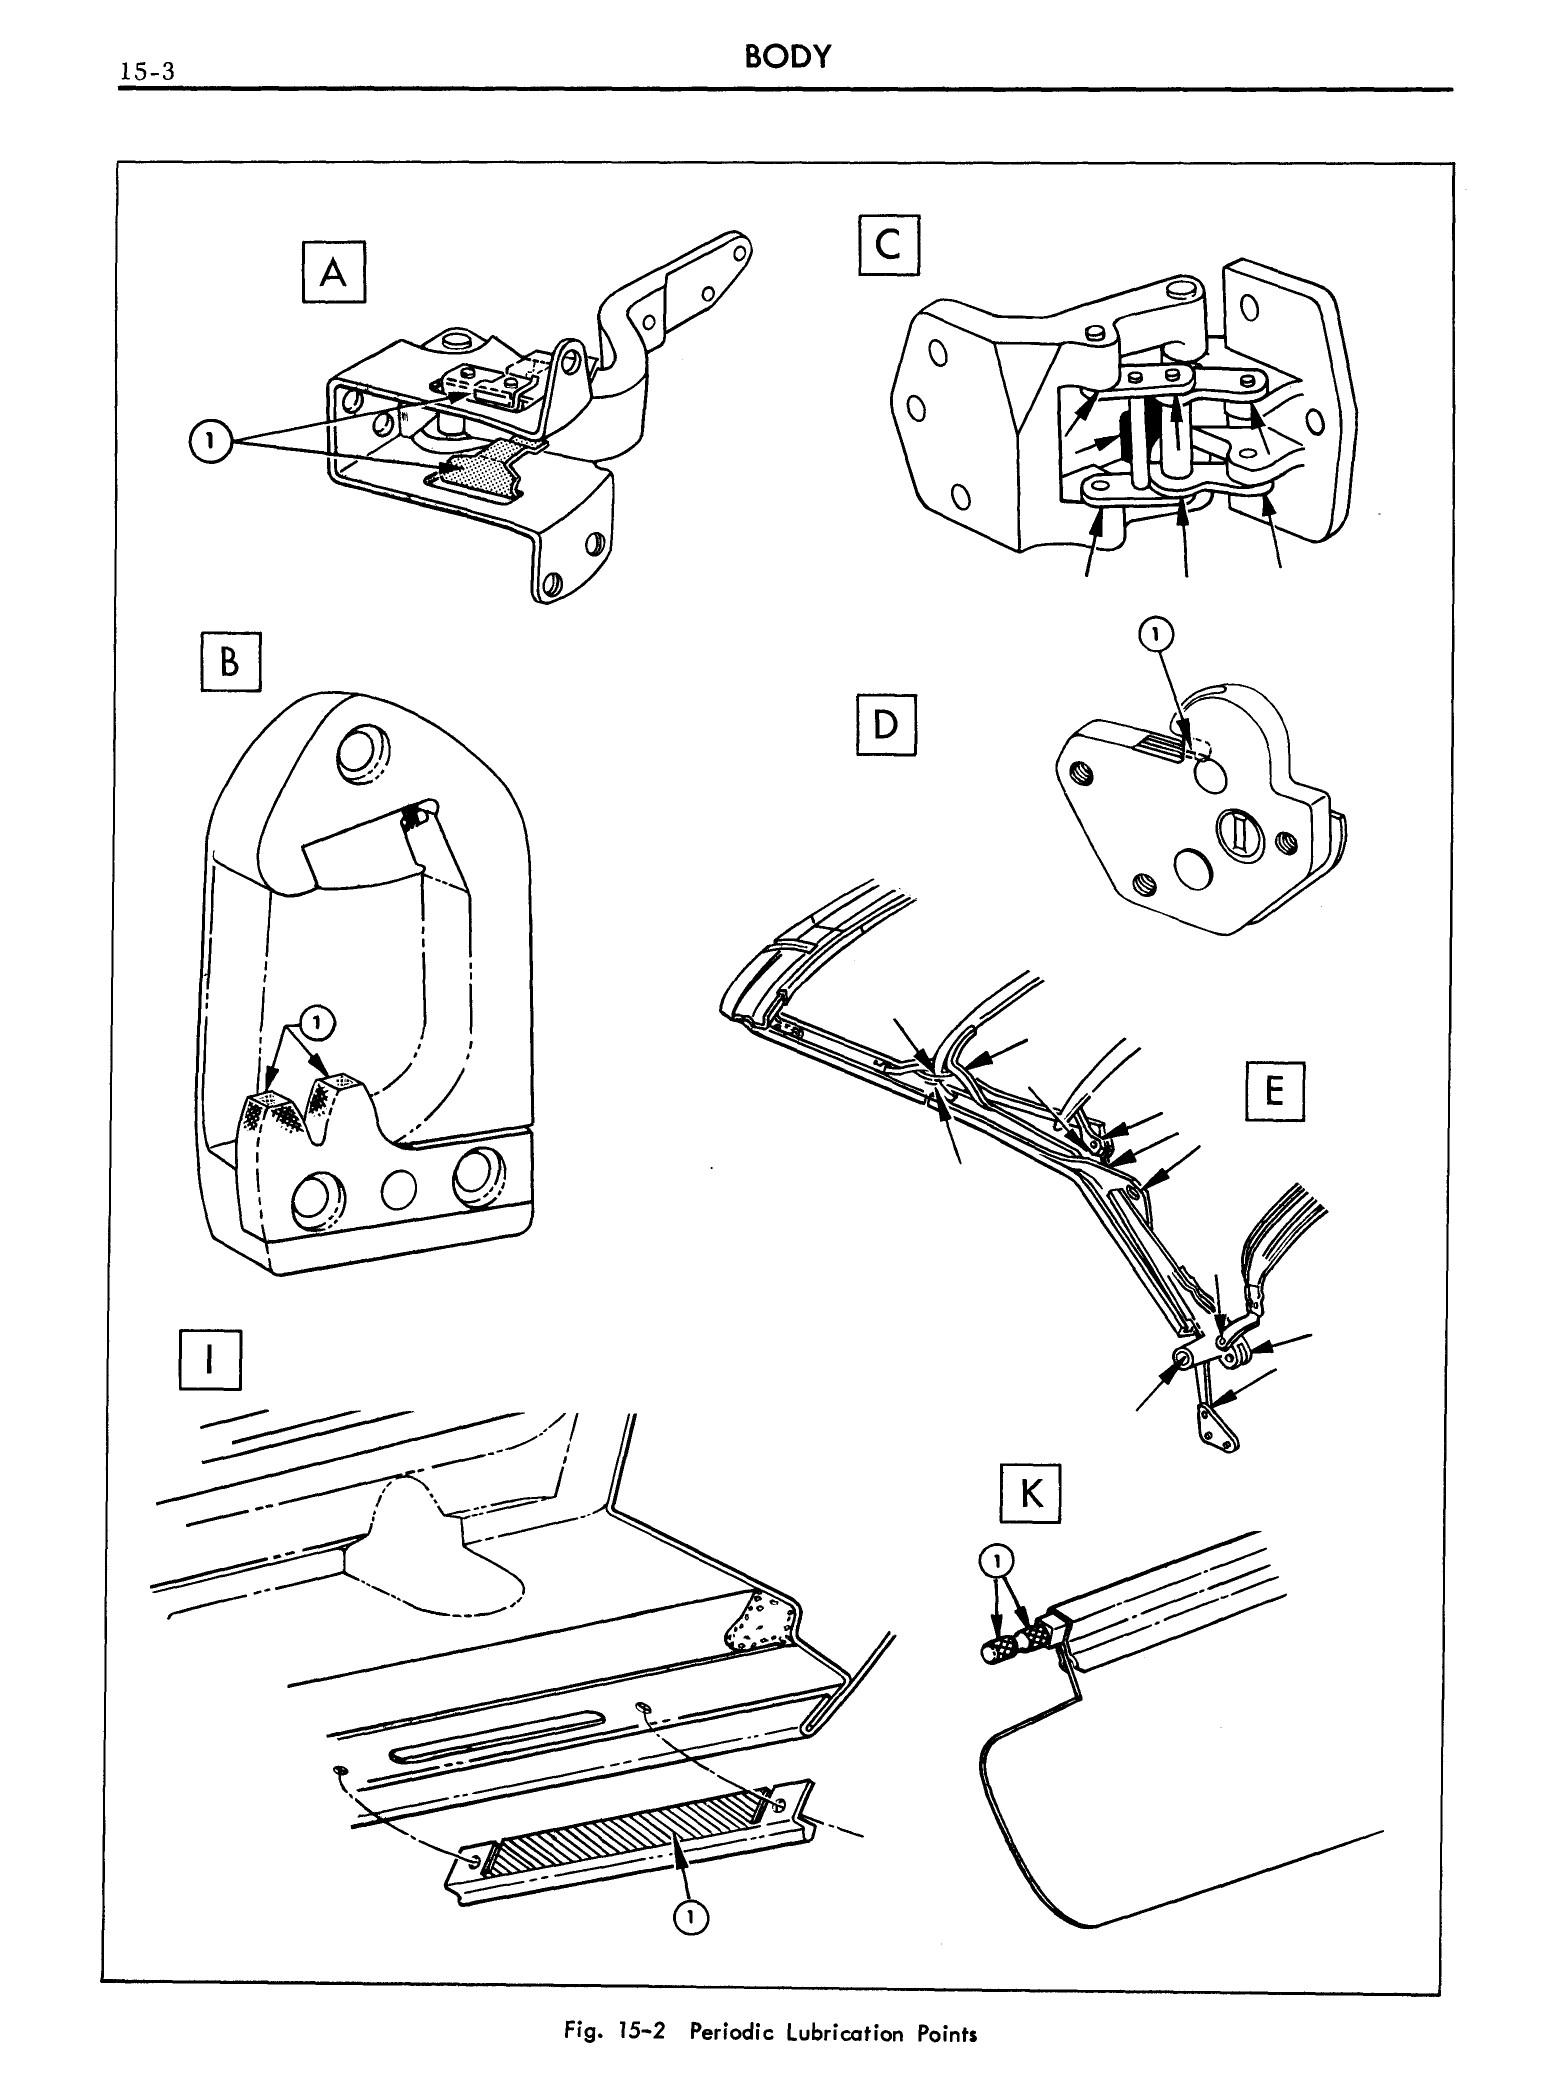 1959 Cadillac Shop Manual- Body Page 3 of 99